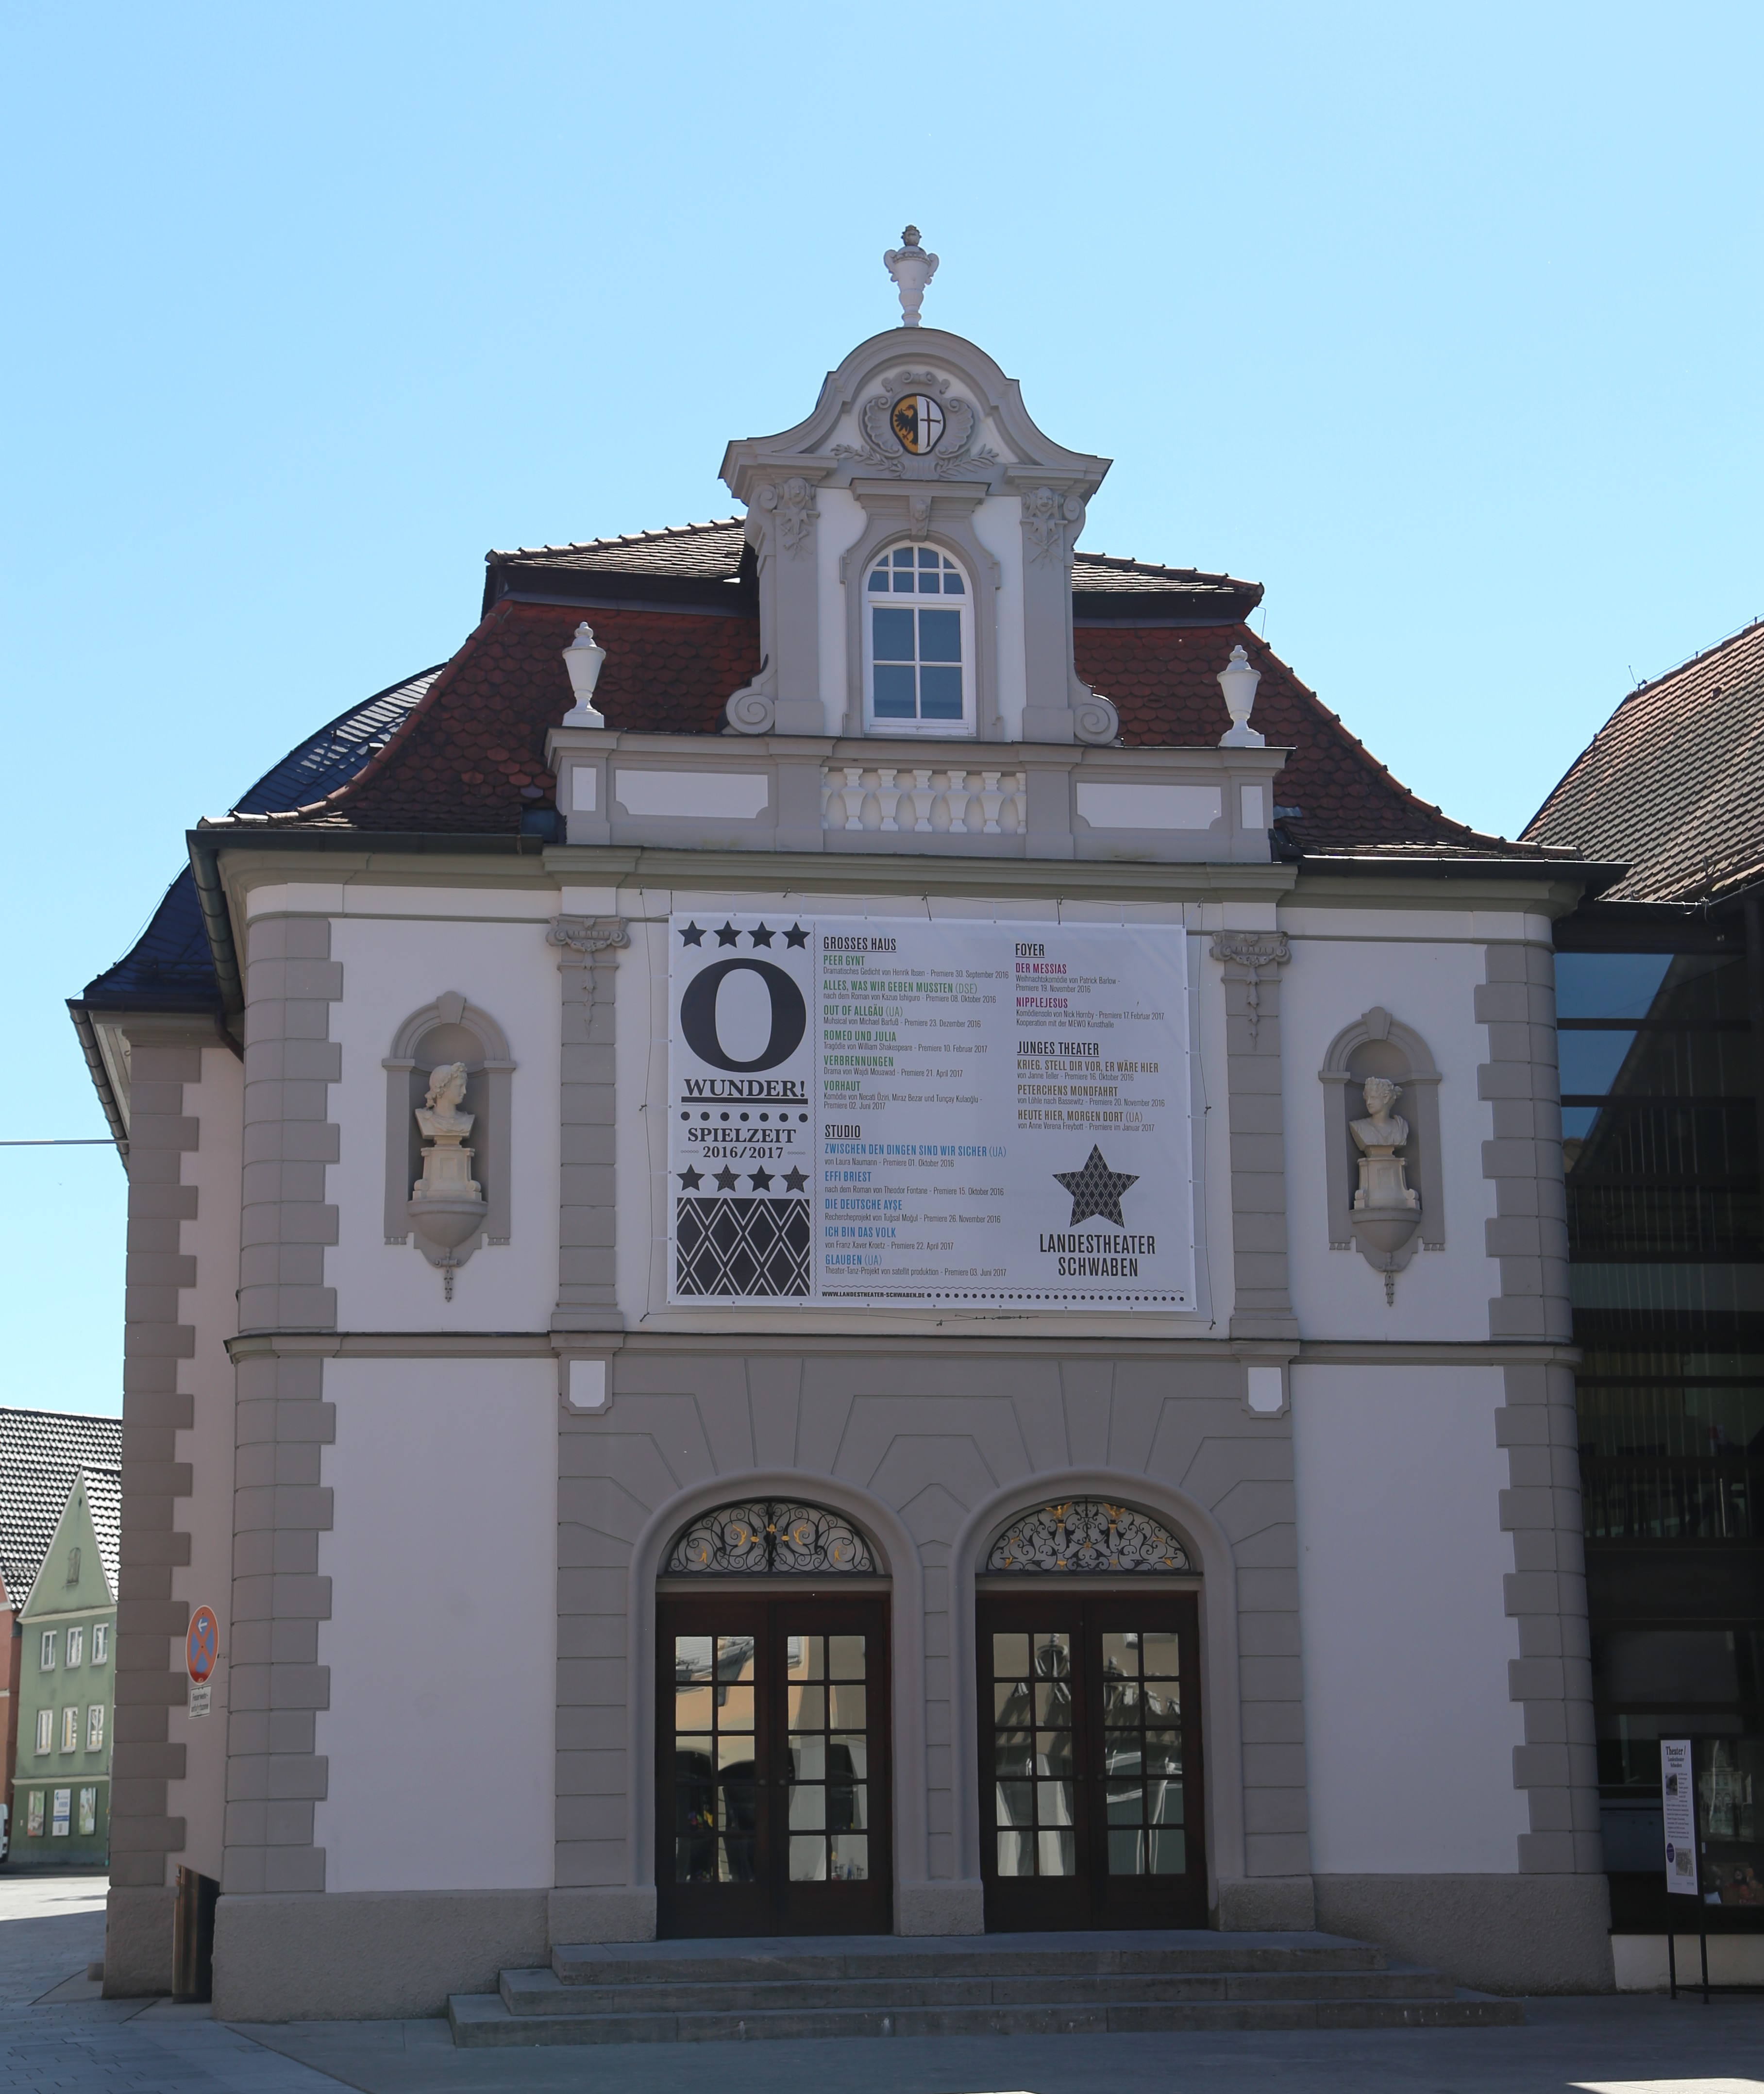 Filetheaterplatz 2 4 6 Stadttheater Memmingen 1jpg